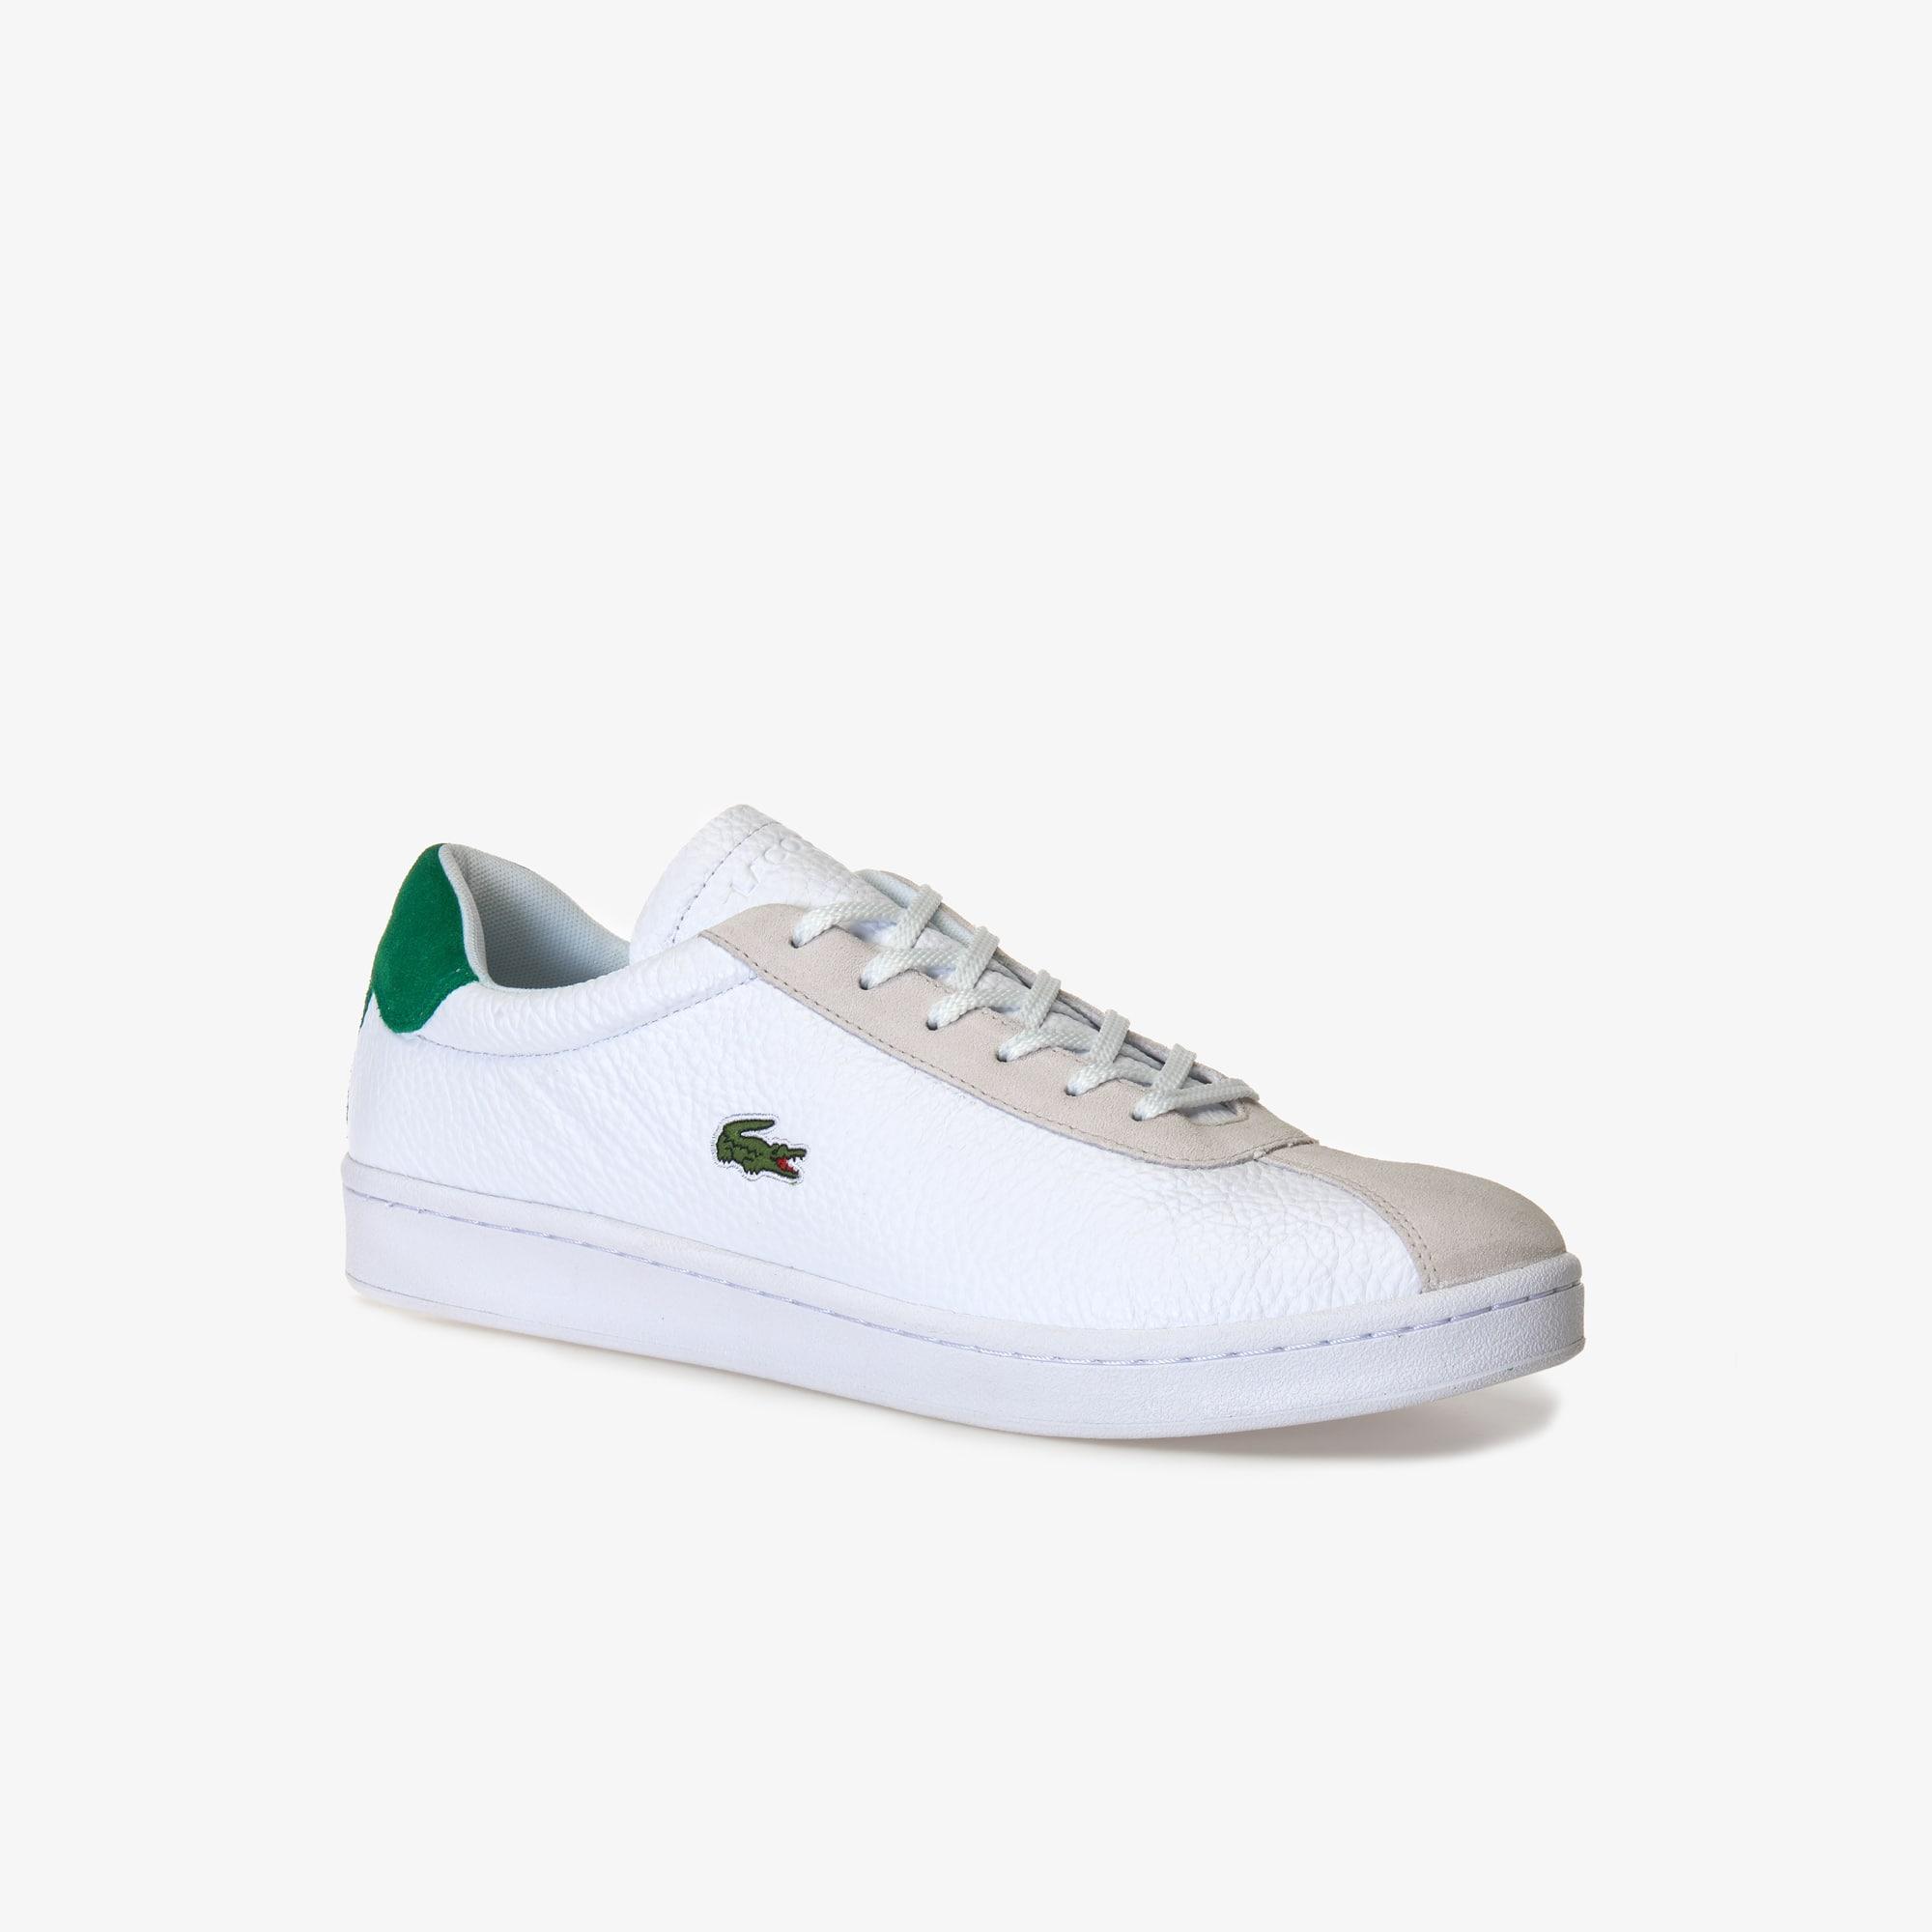 c45b4277 Zapatos para Hombre | LACOSTE